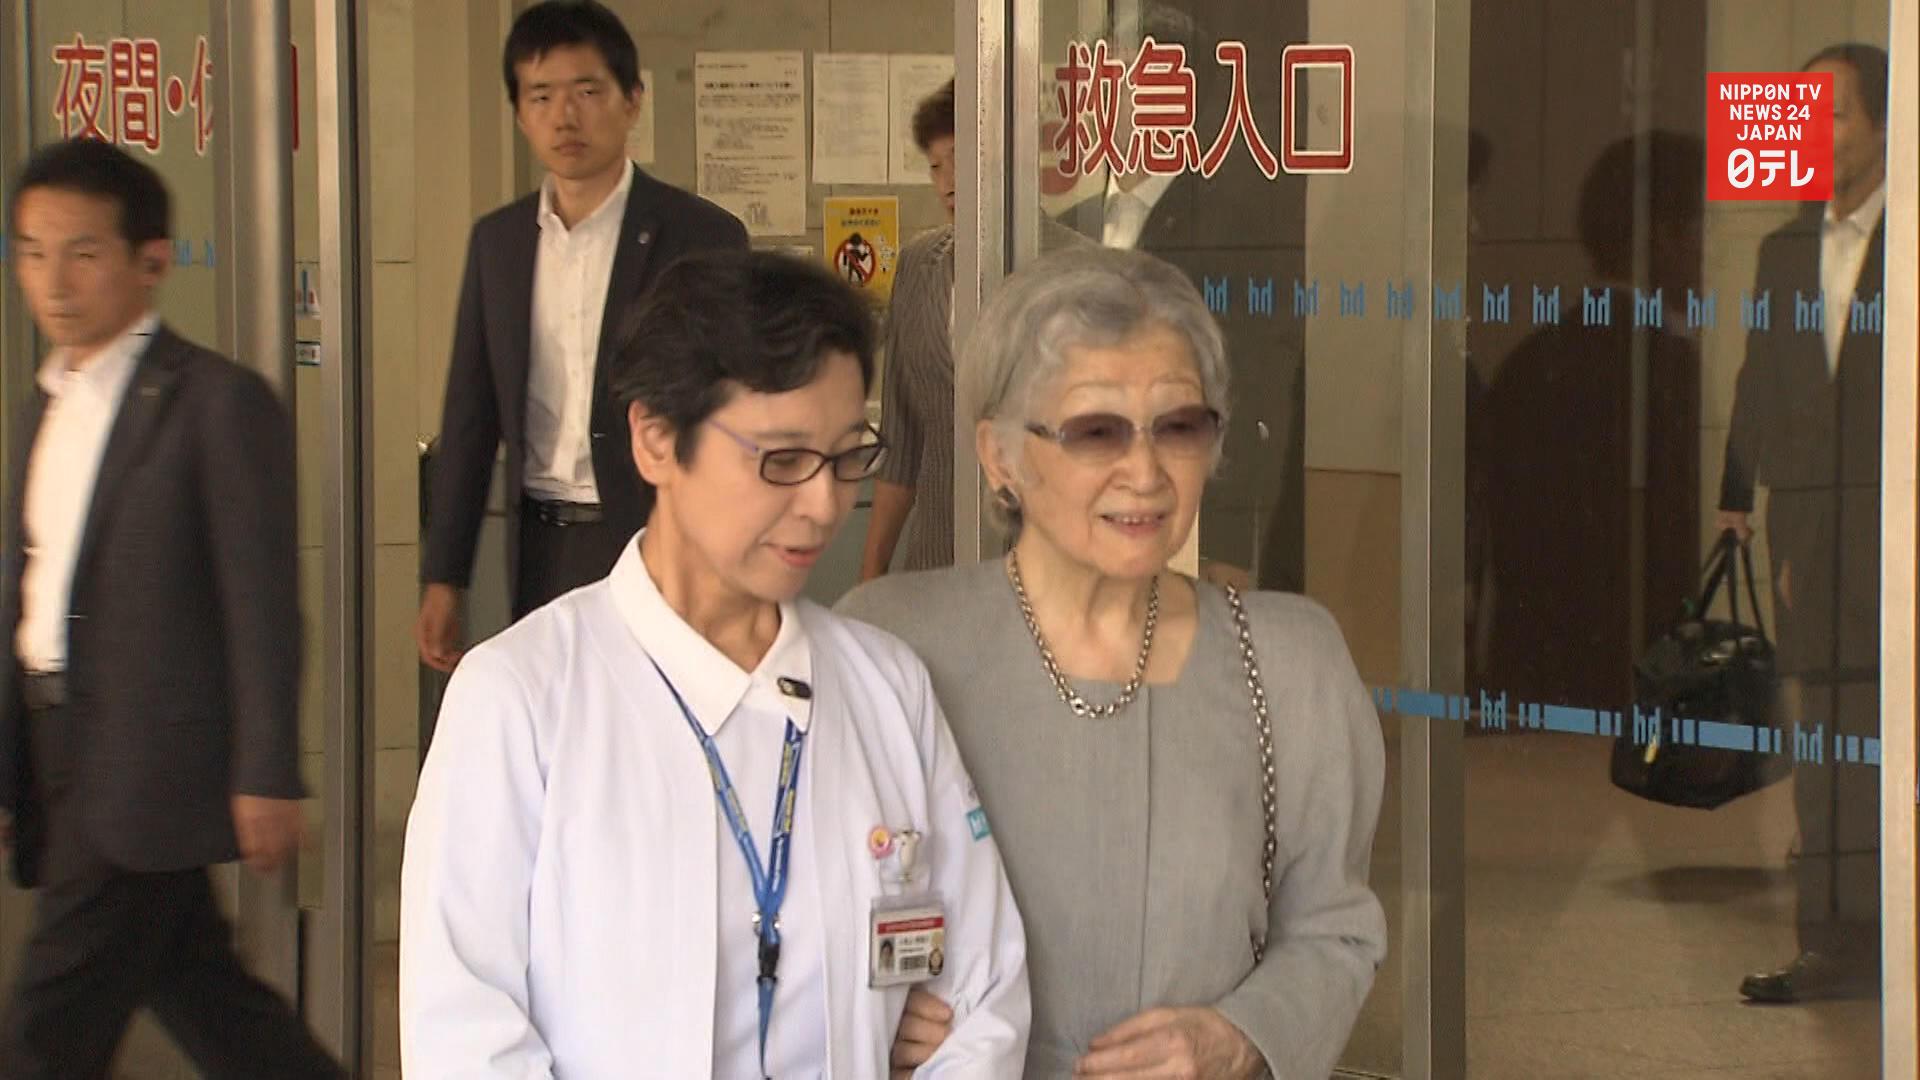 SOCIETY | Nippon TV NEWS24 JAPAN